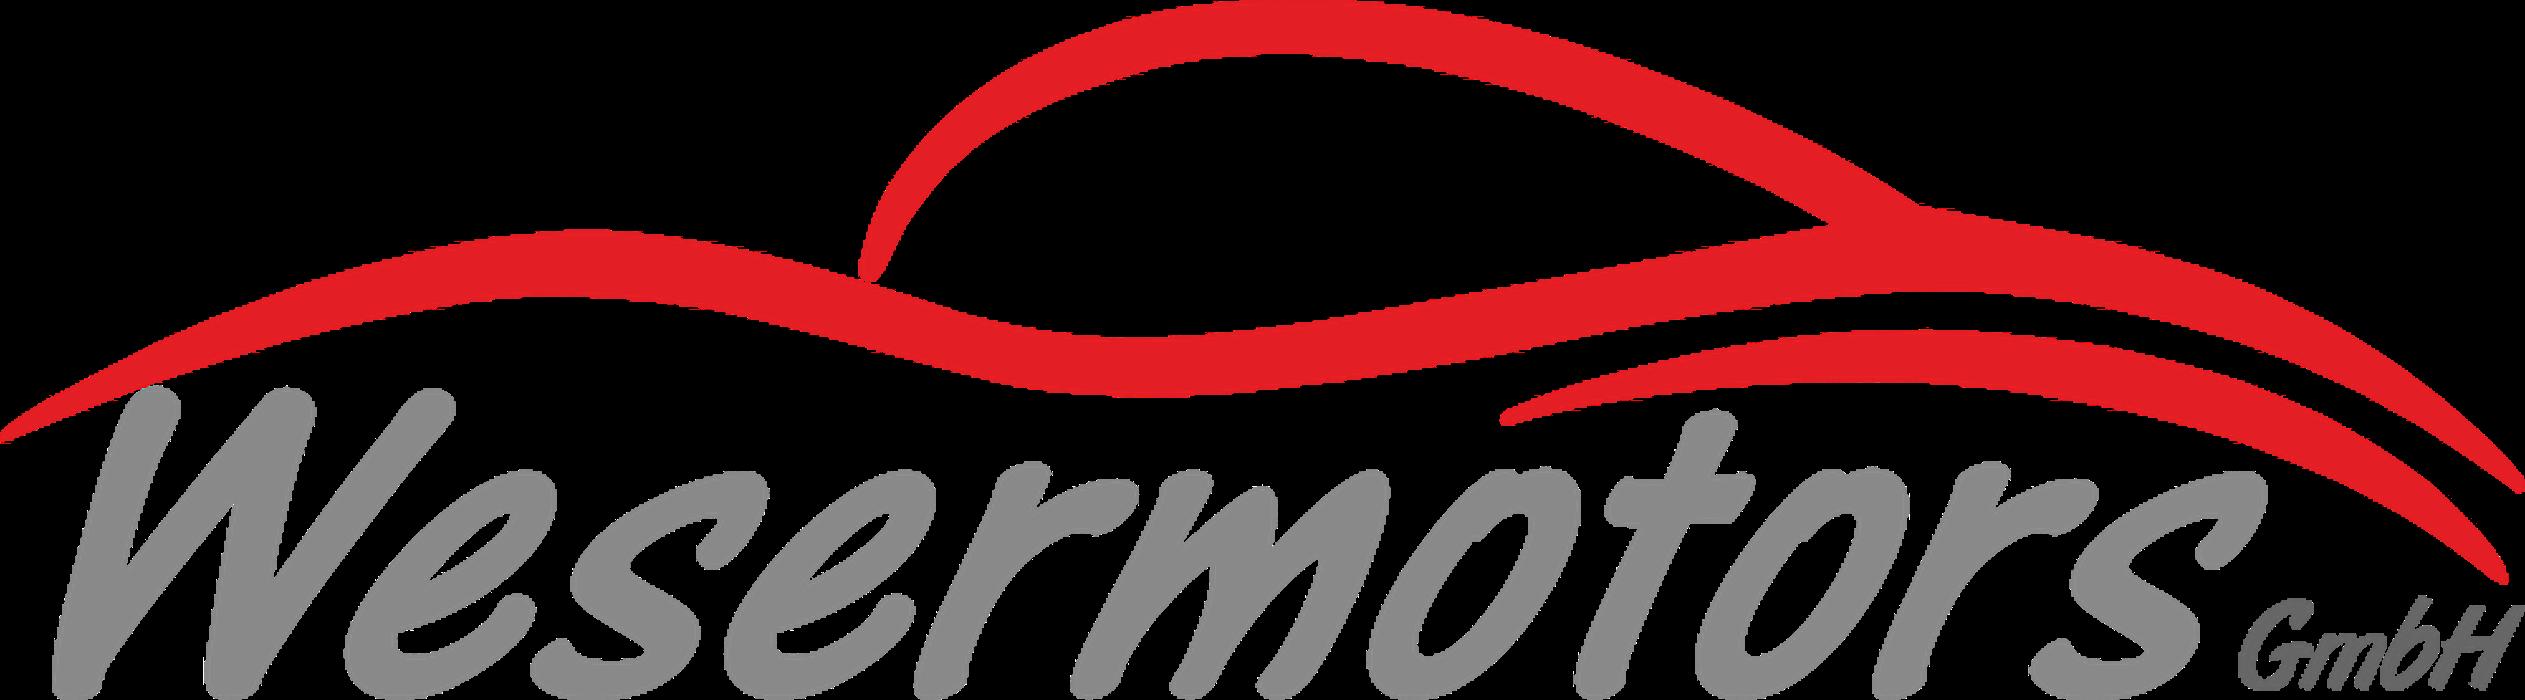 Bild zu Wesermotors GmbH in Bremen